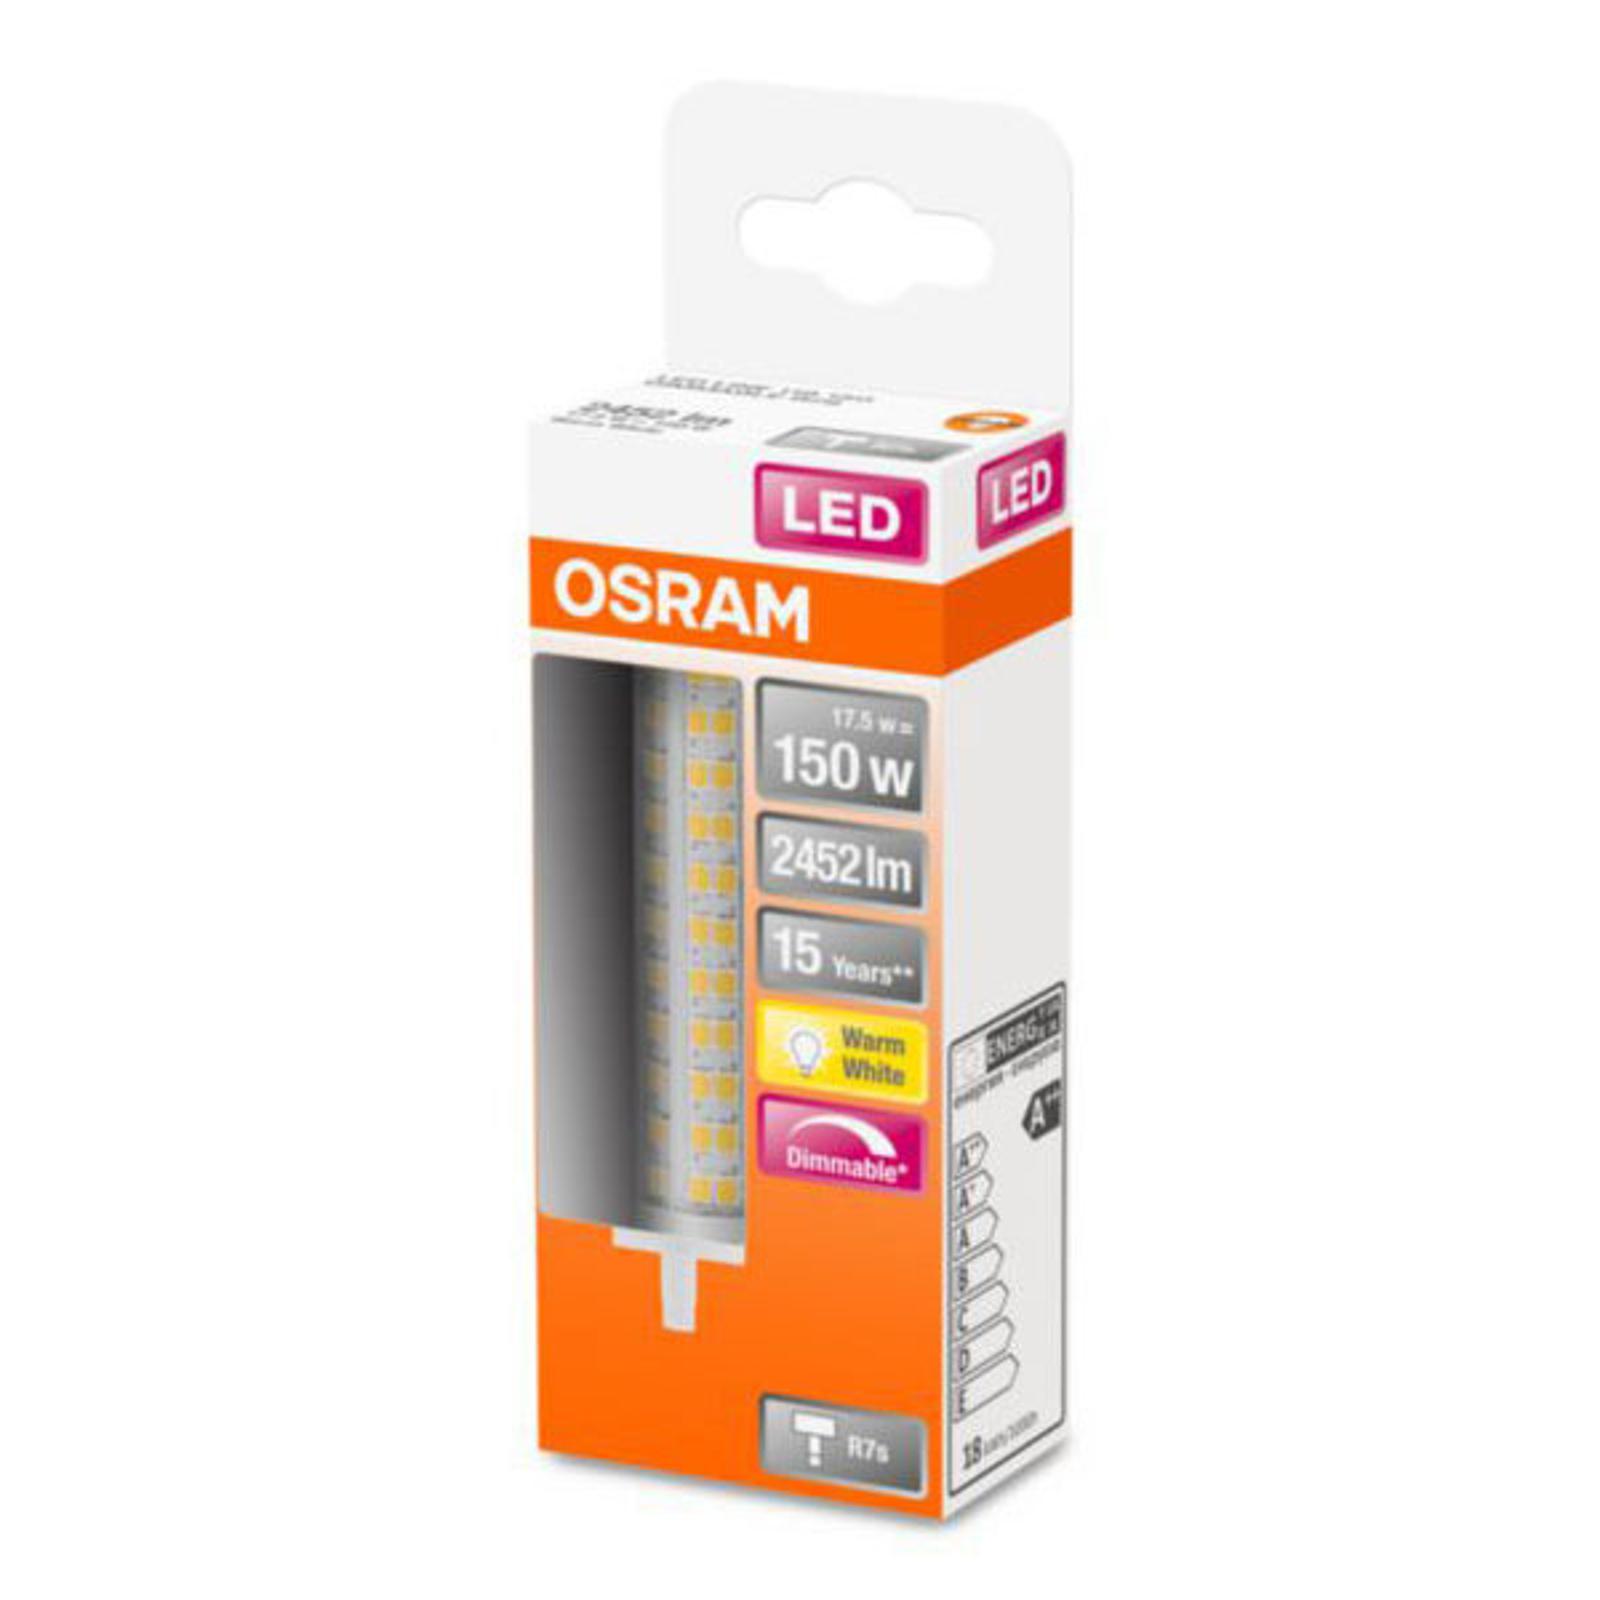 OSRAM-LED-lamppu R7s 17,5W 2 700 K himmennettävä